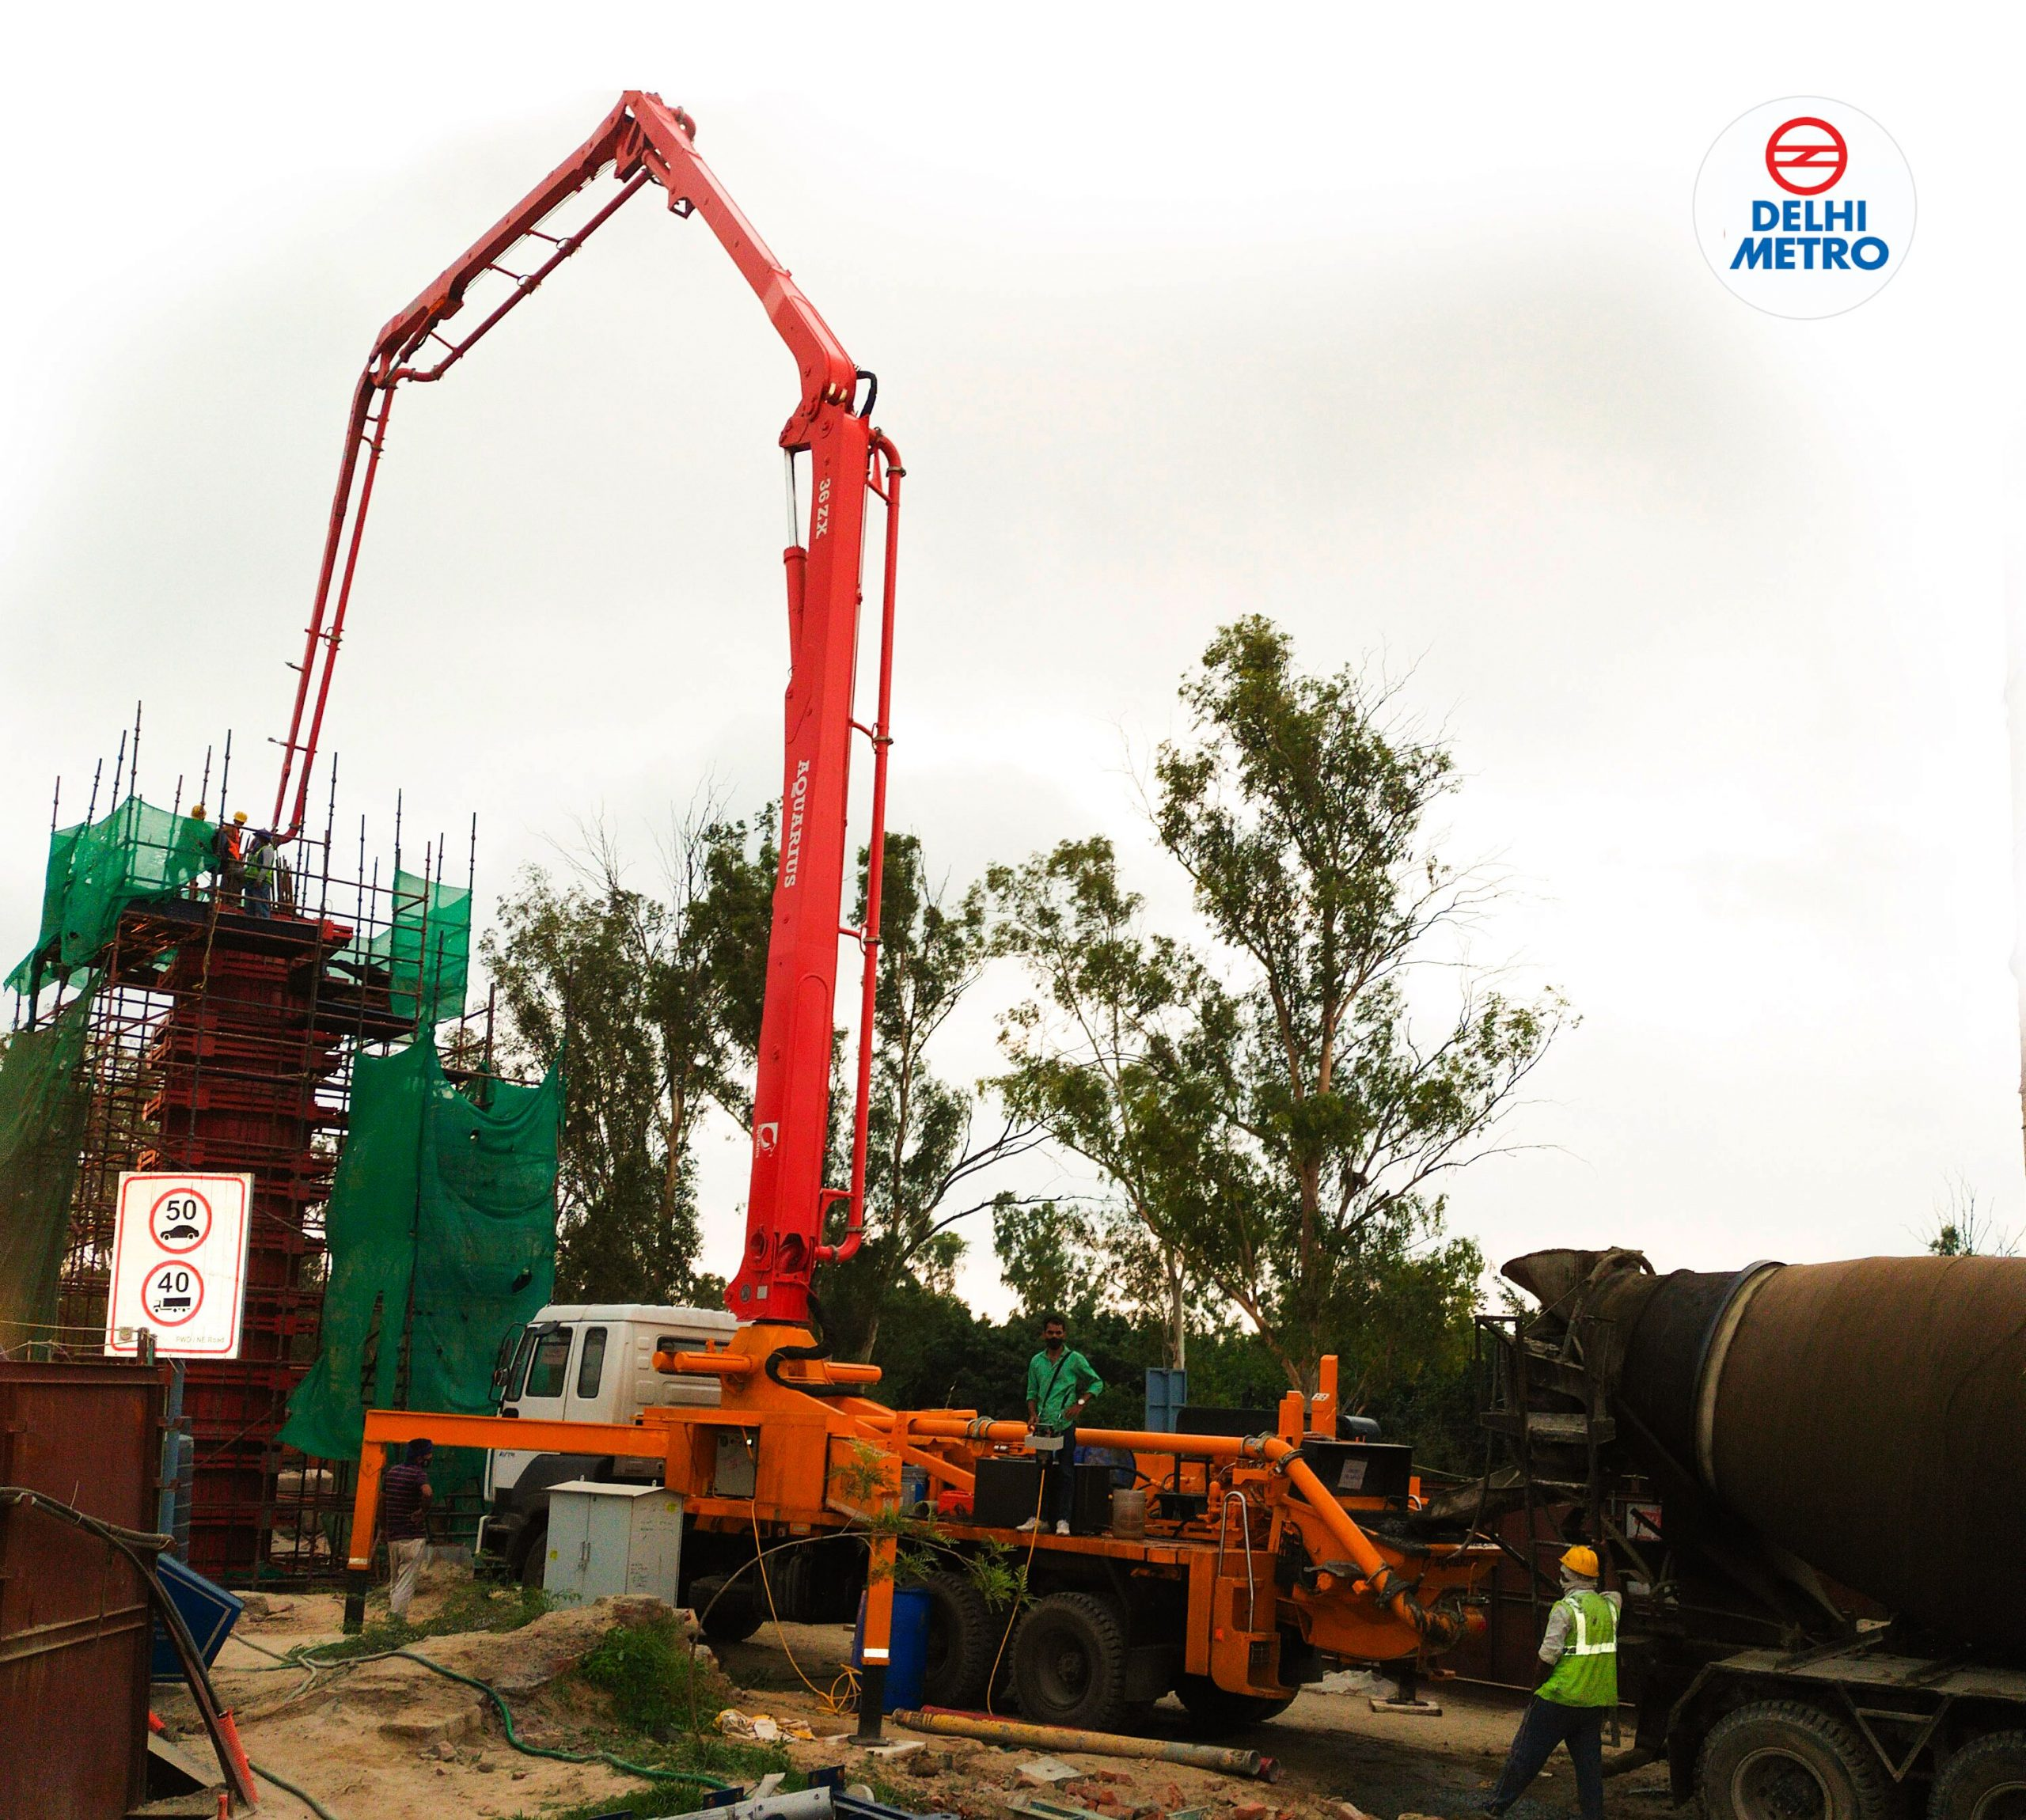 Aquarius 36 ZX Boom Pump working at M/s Rajraman Infra for Delhi Metro Bhajanpura Project